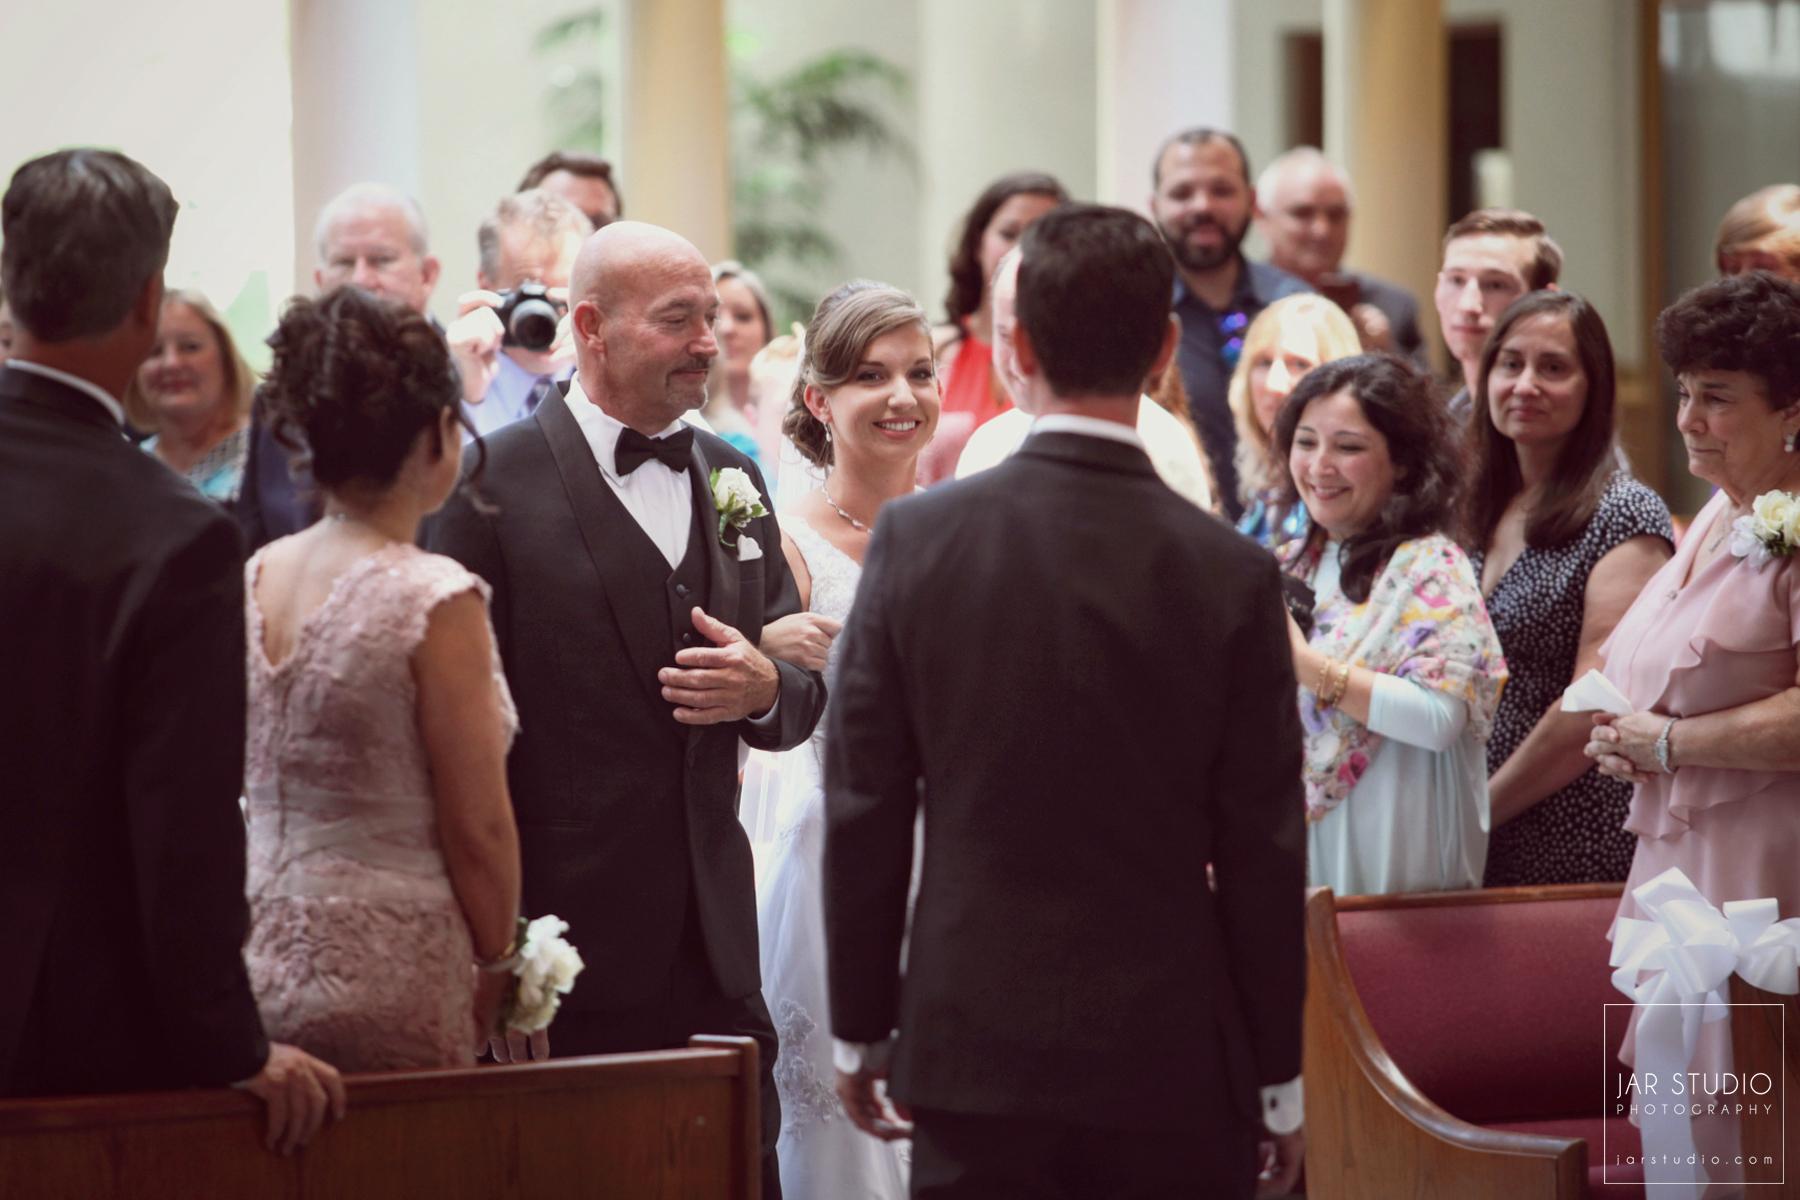 10-orlando-weddings-walking-down-the-aisle-first-look-jarstudio-photography.JPG